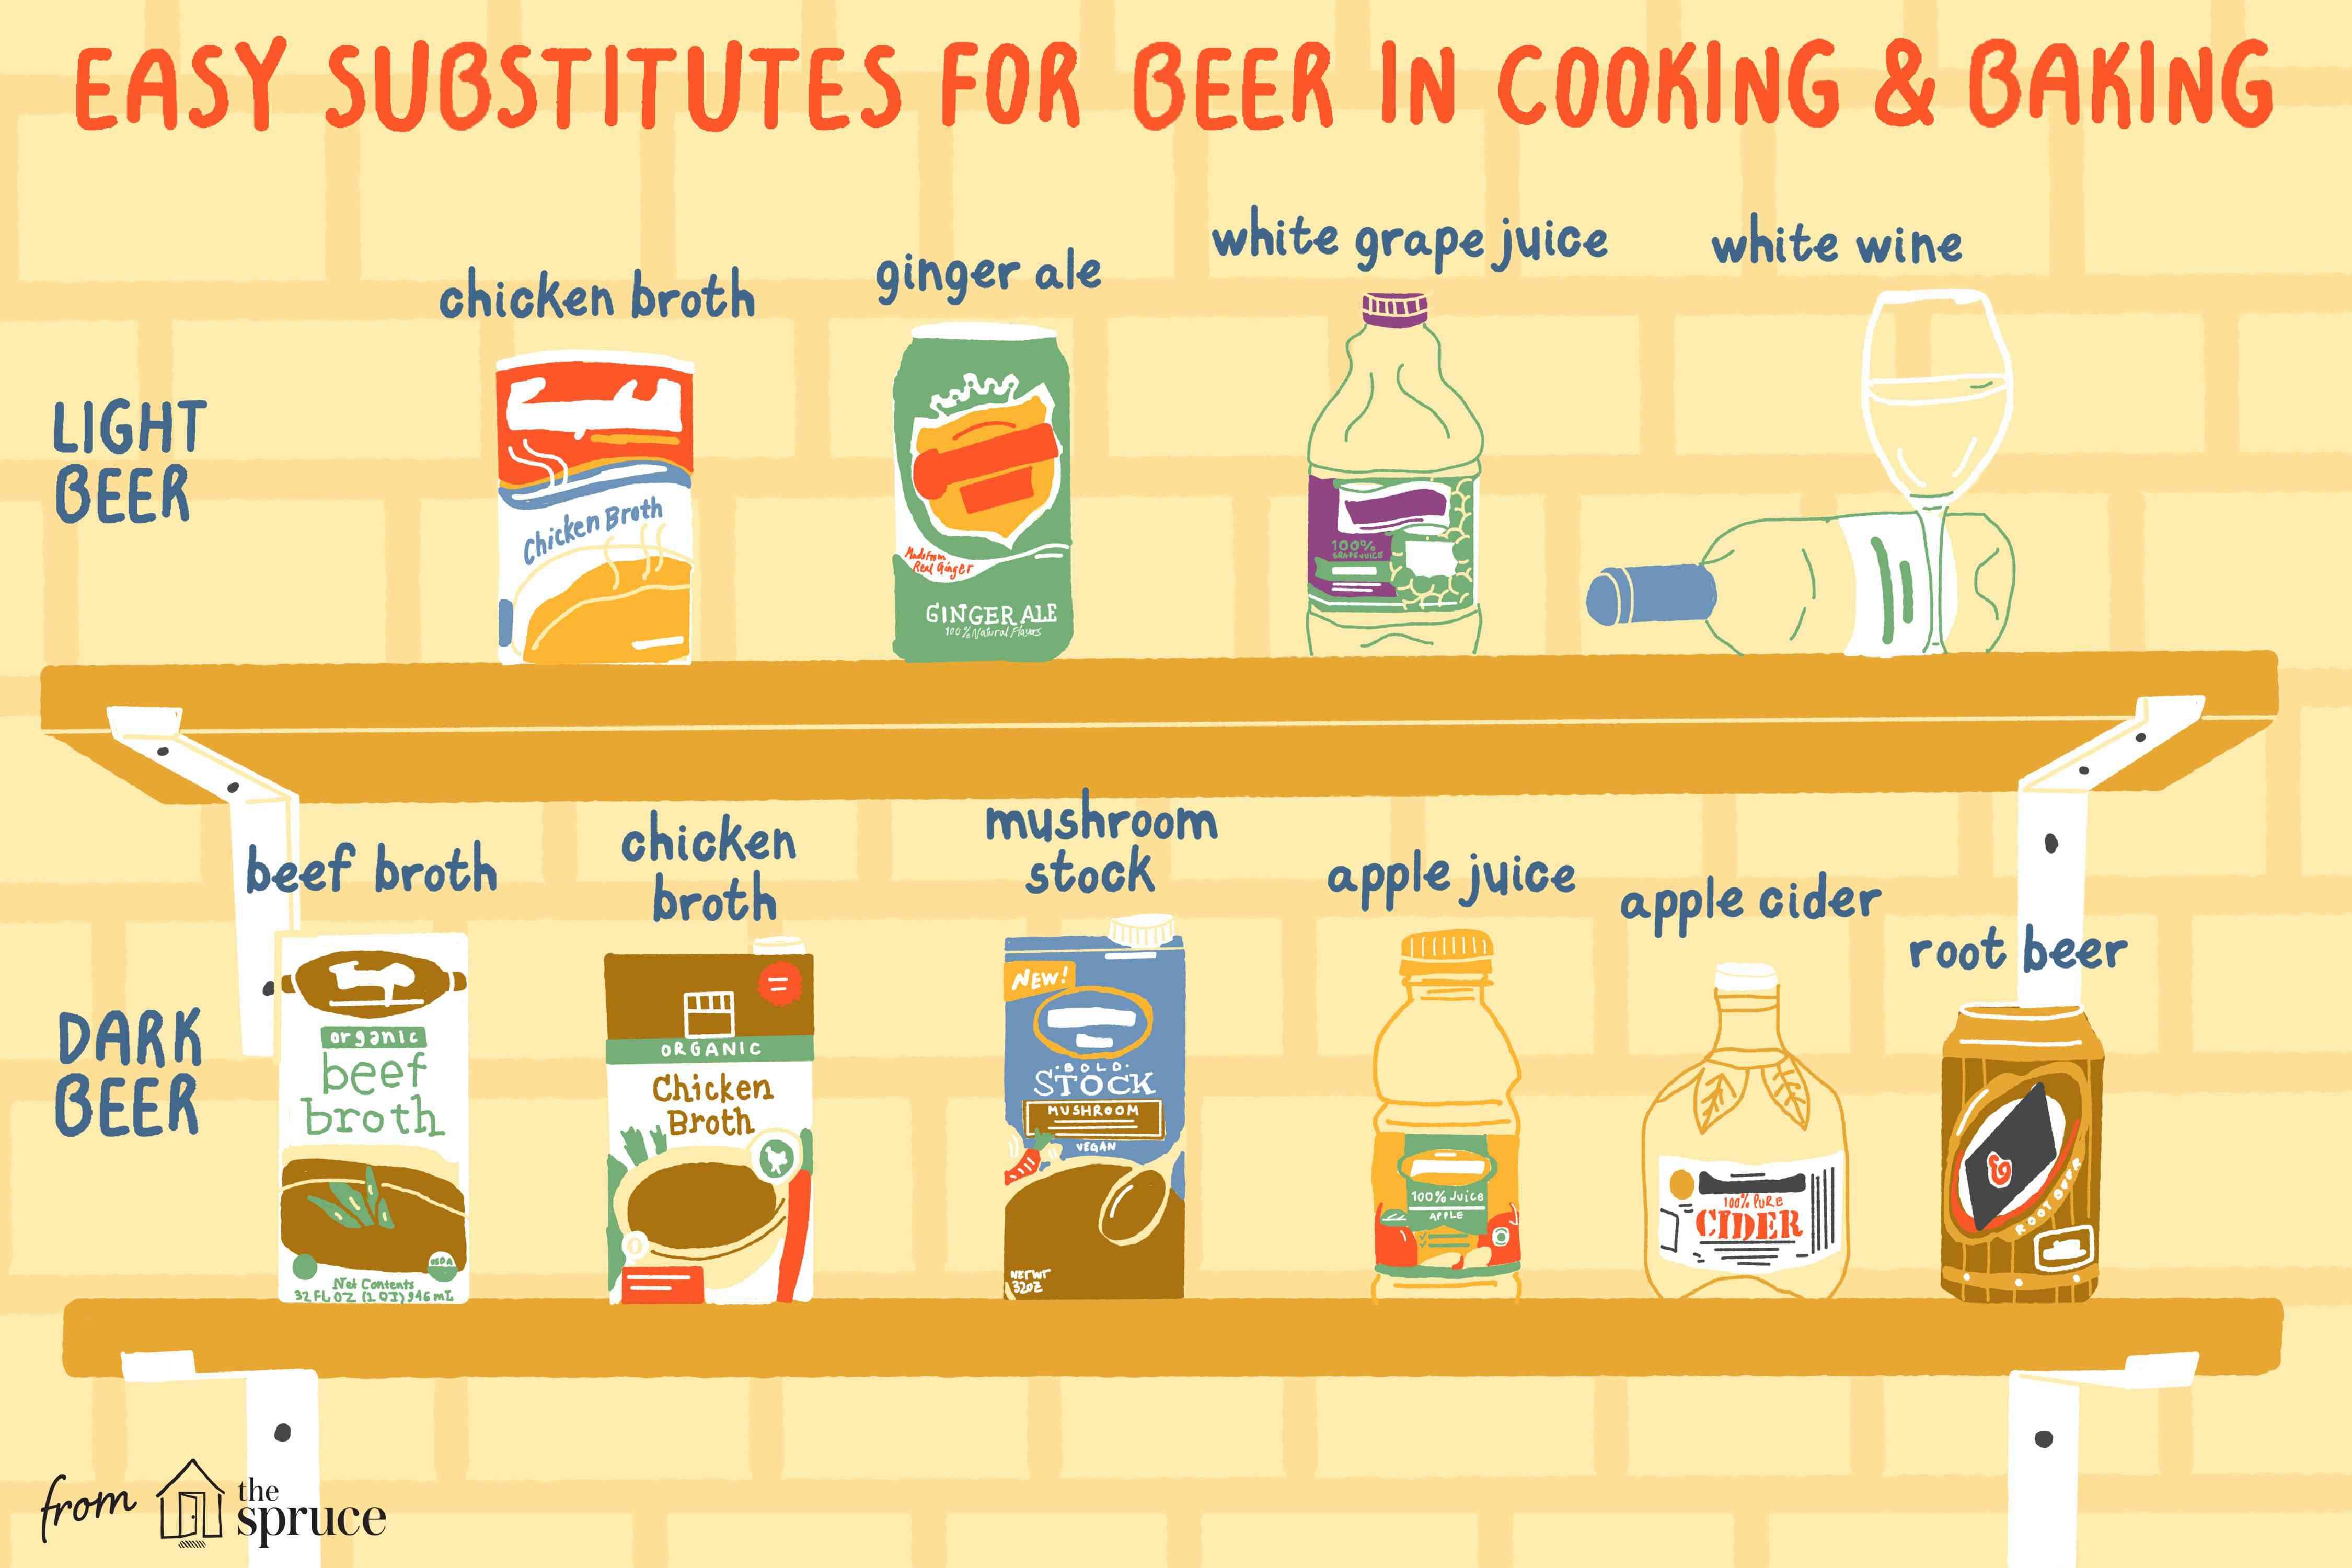 beer substitutes